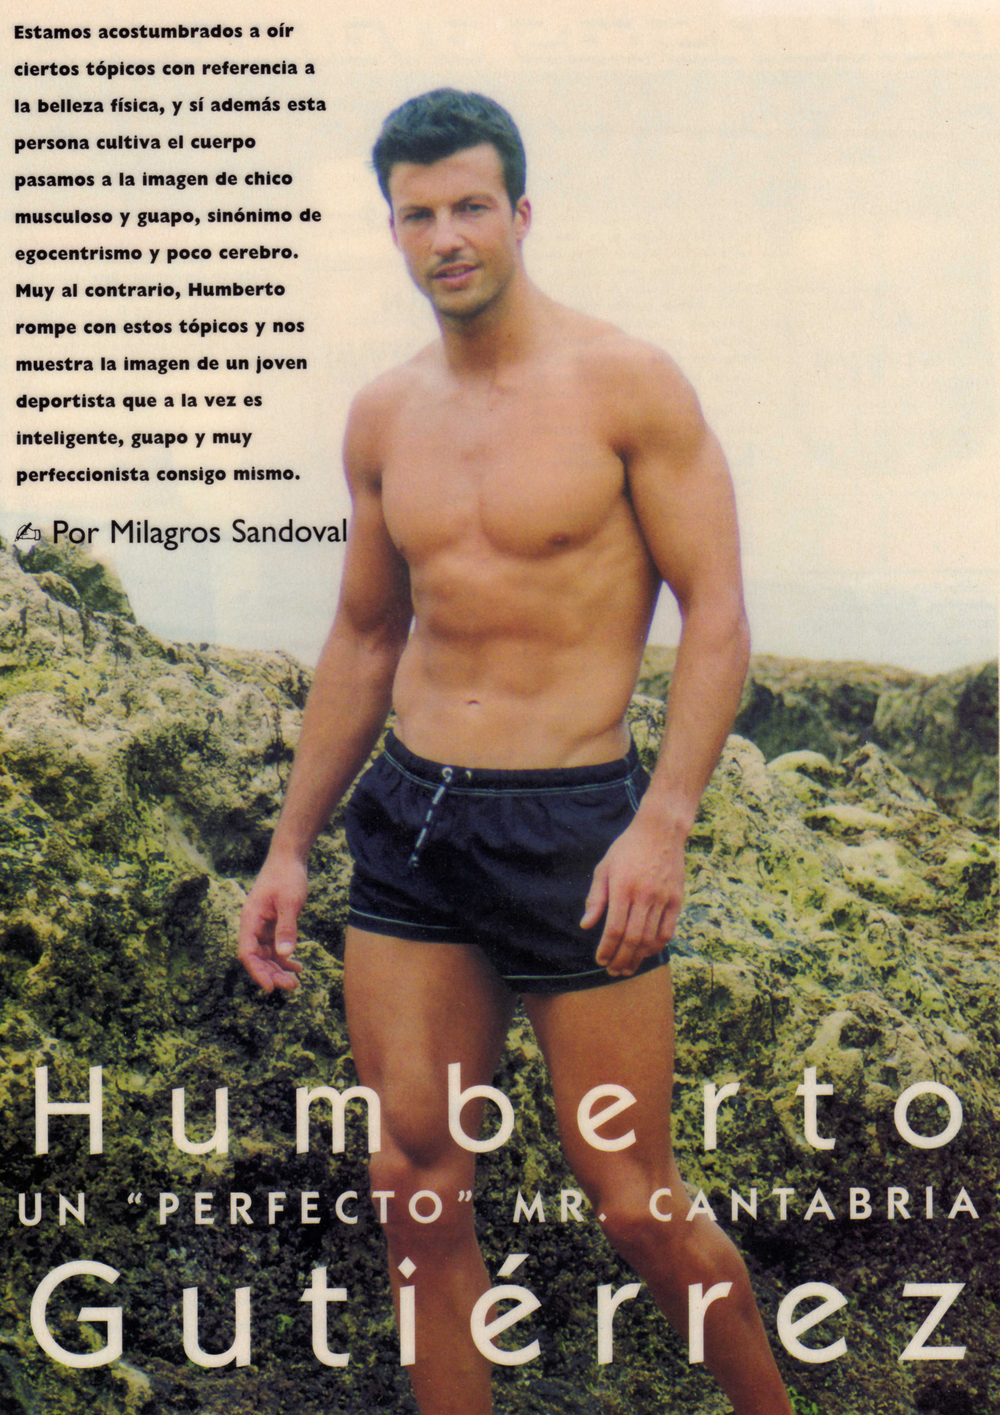 Humberto Gutierrez  MR CANTABRIA. 2 CLASIFICADO MR ESPANA 1999